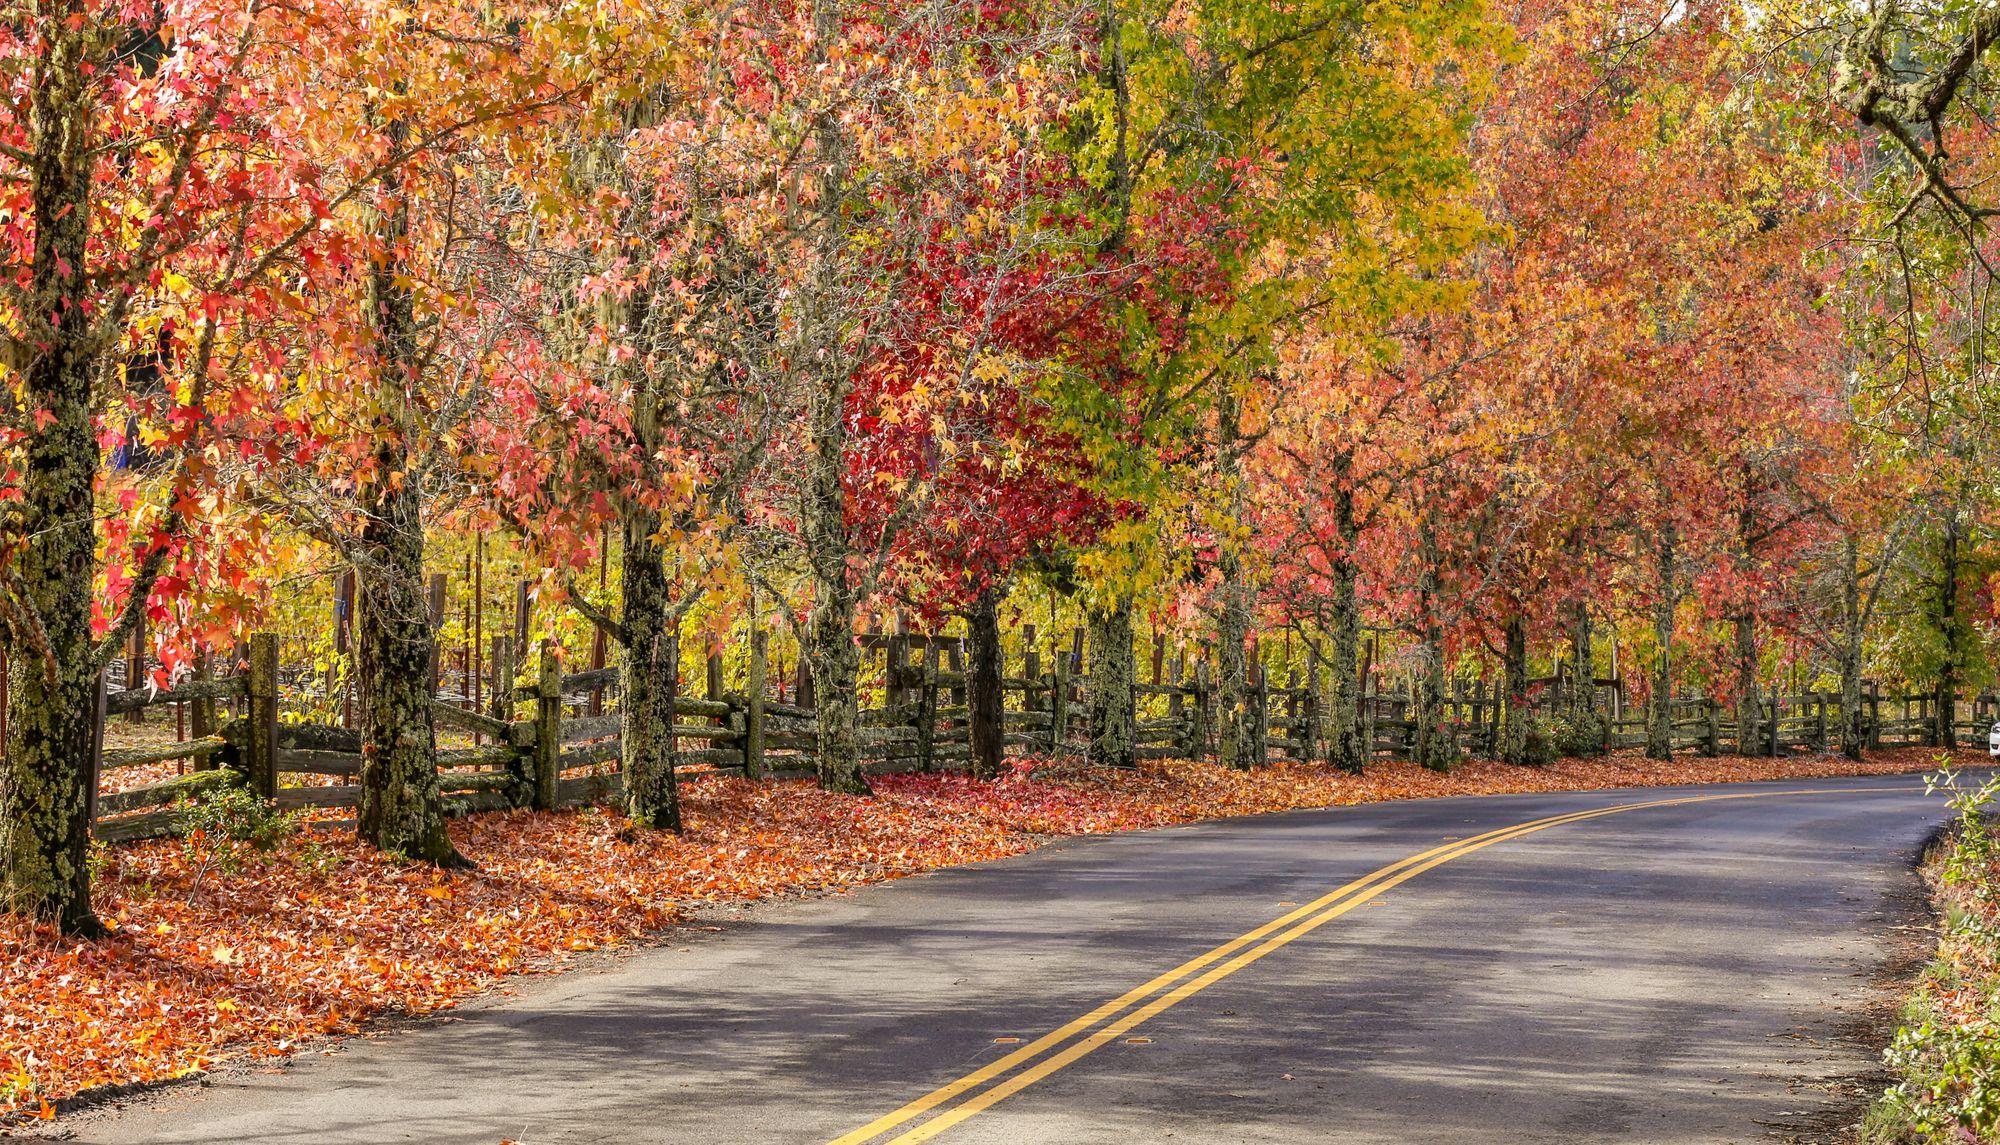 Bike Path in Michigan in the fall